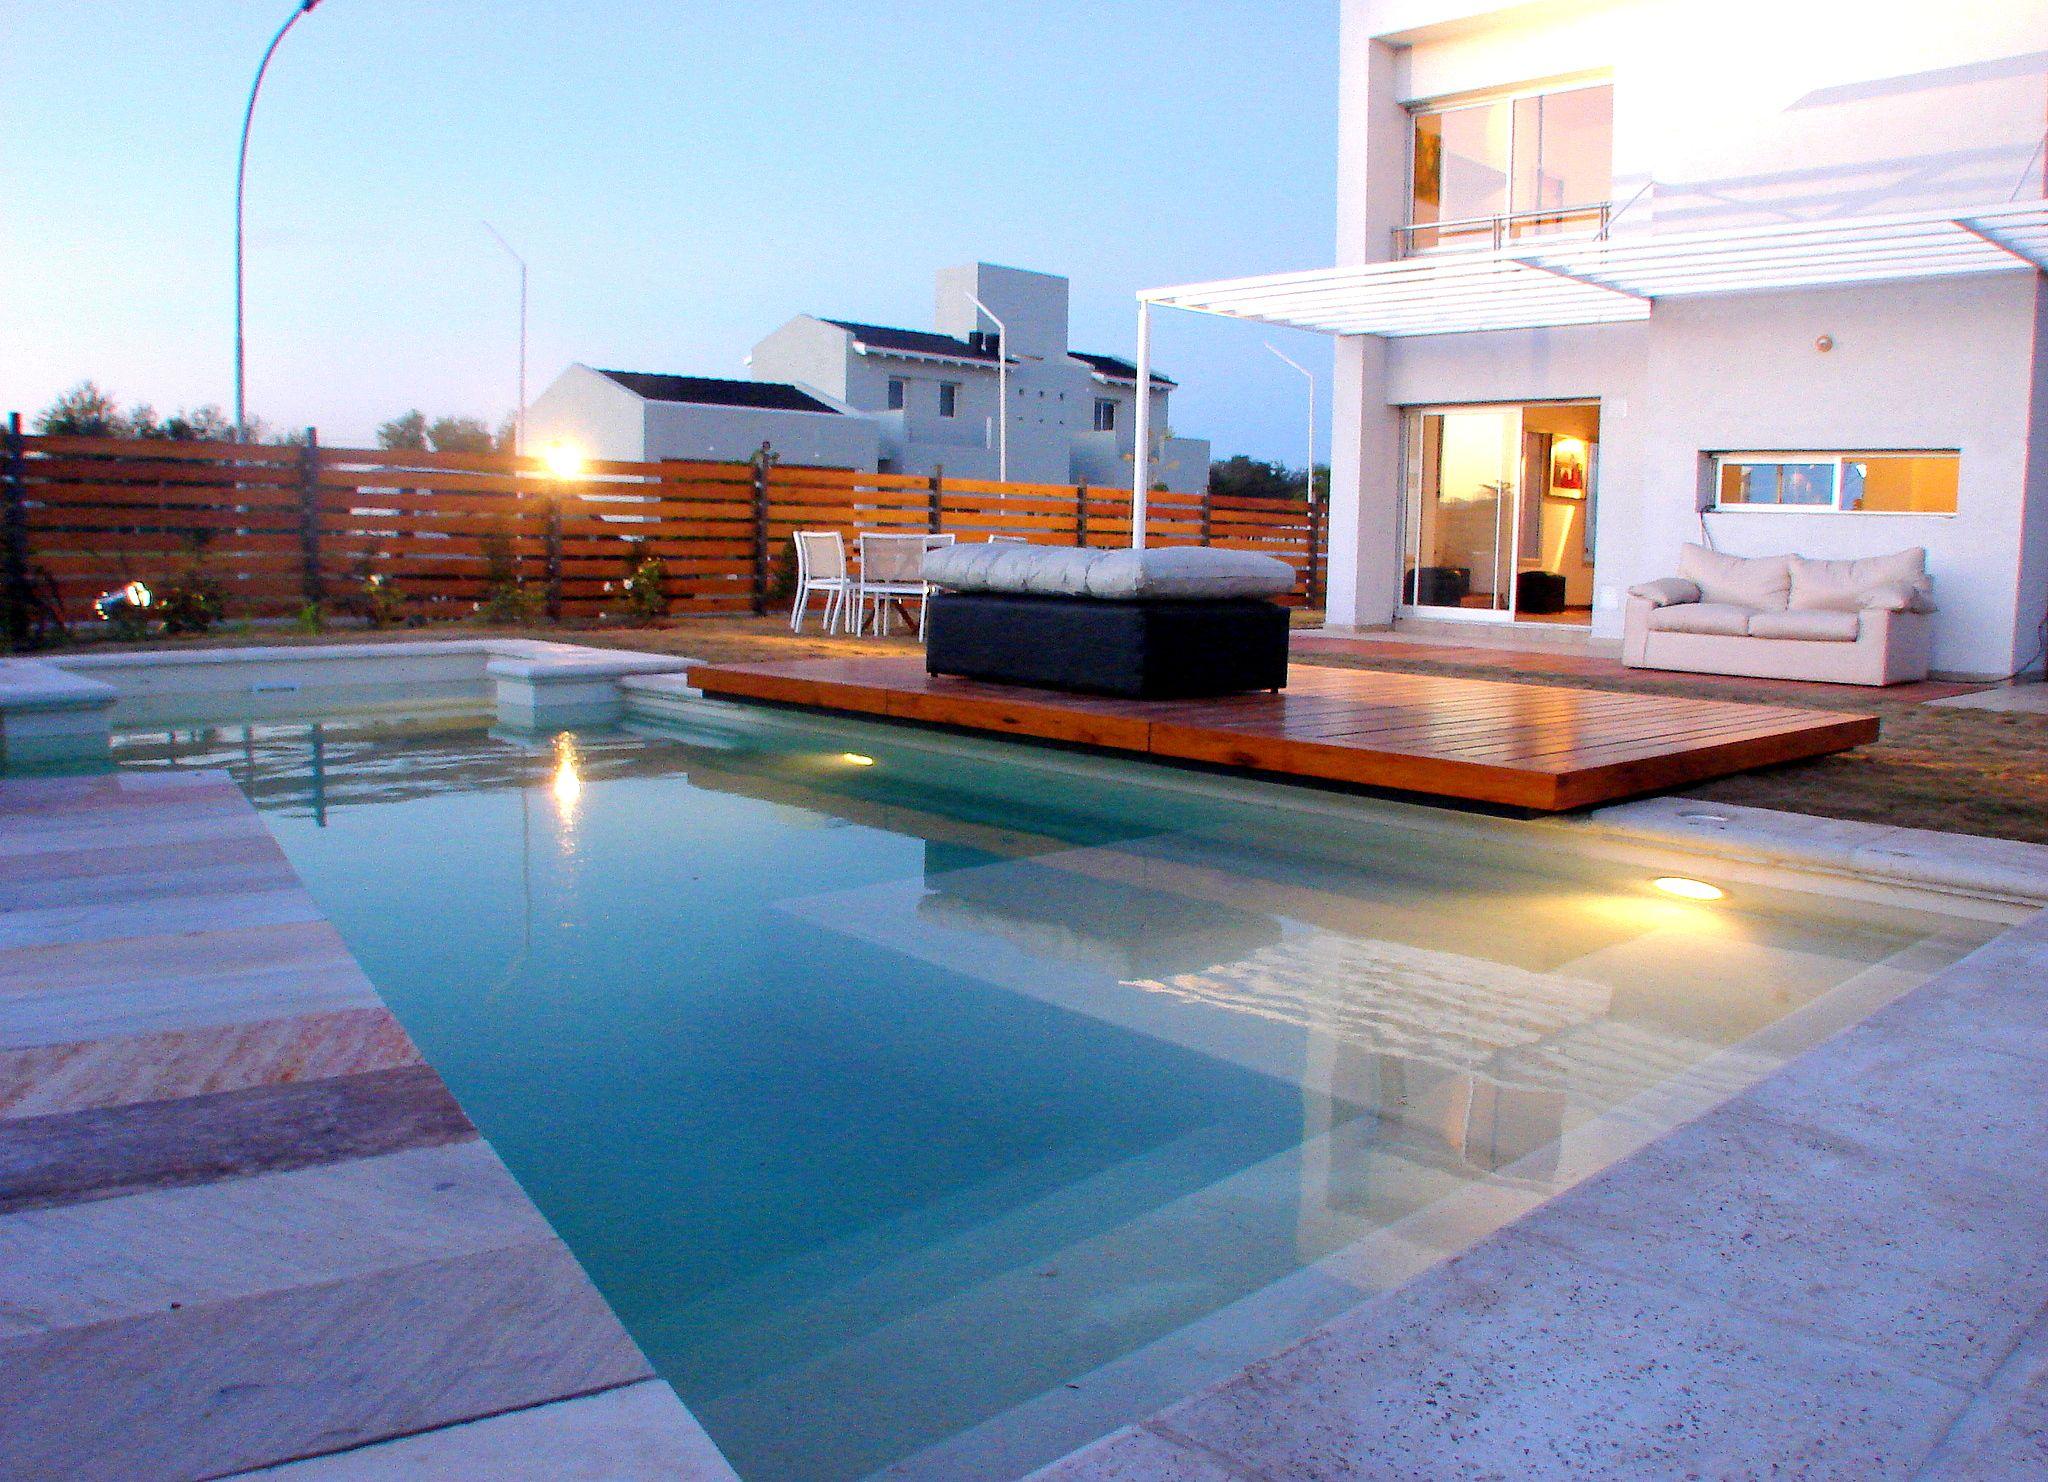 piscina - muro revestido en piedra - deck de madera - piscina